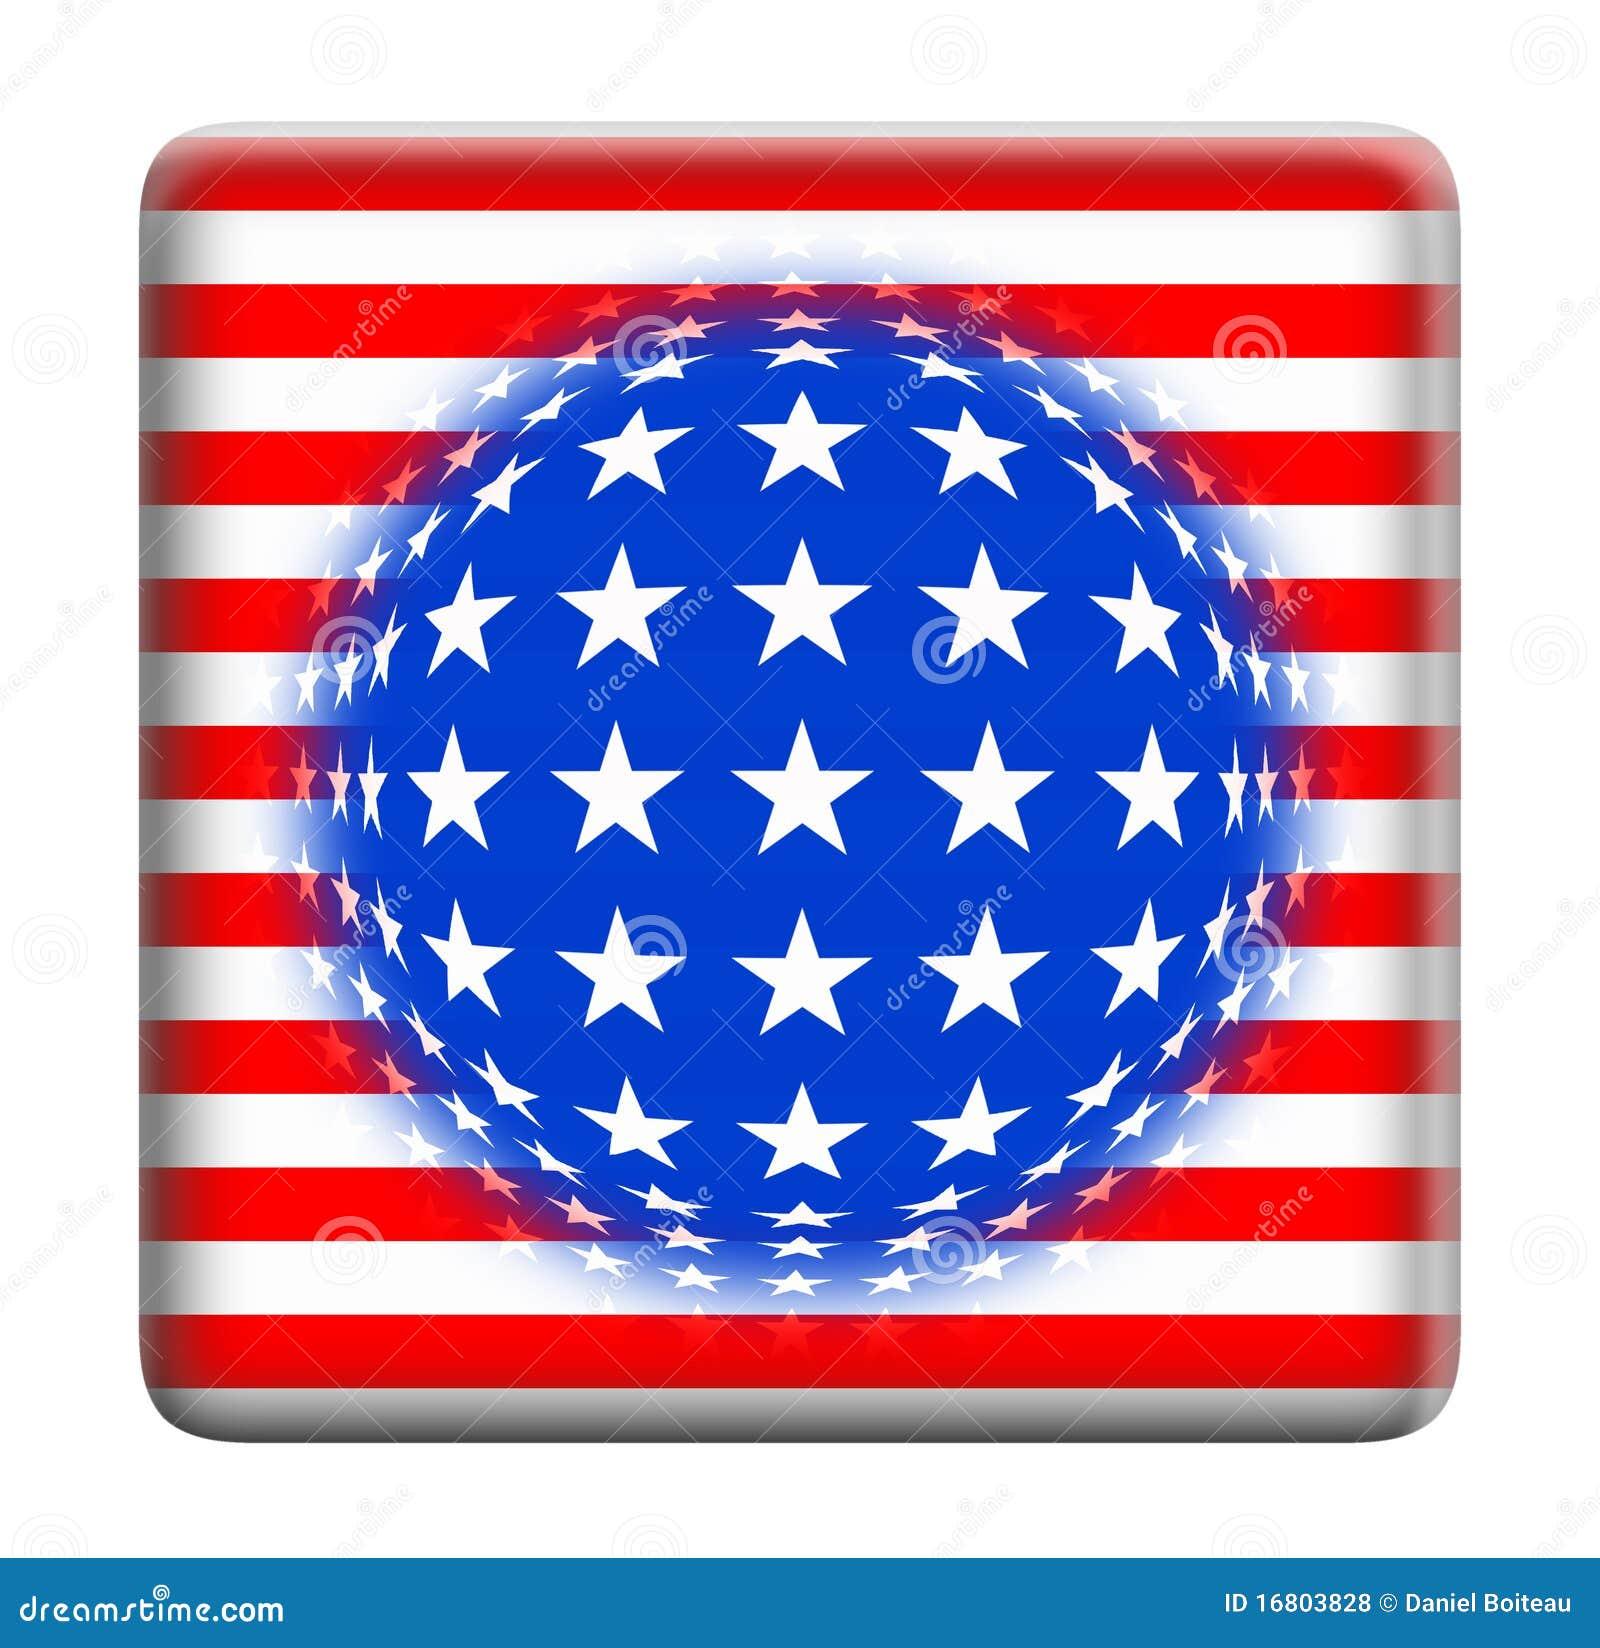 Knappfantasiflagga USA